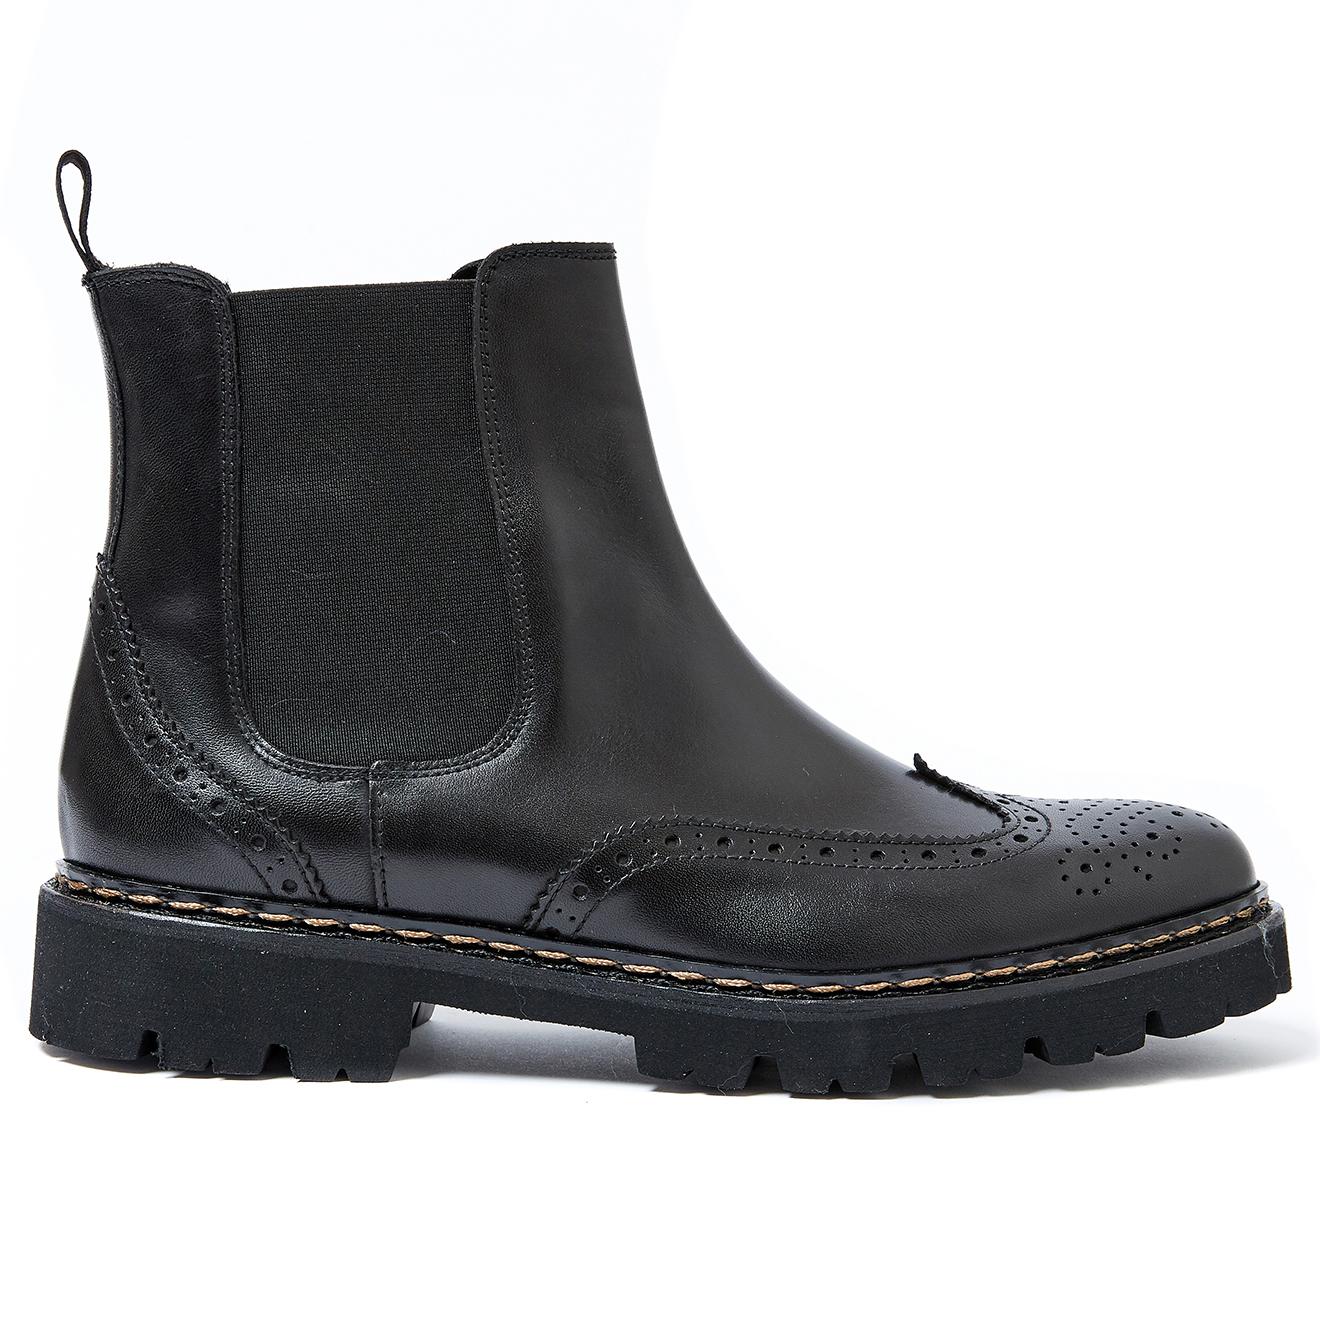 Chelsea Boots en Cuir James noires - British Passport - Modalova